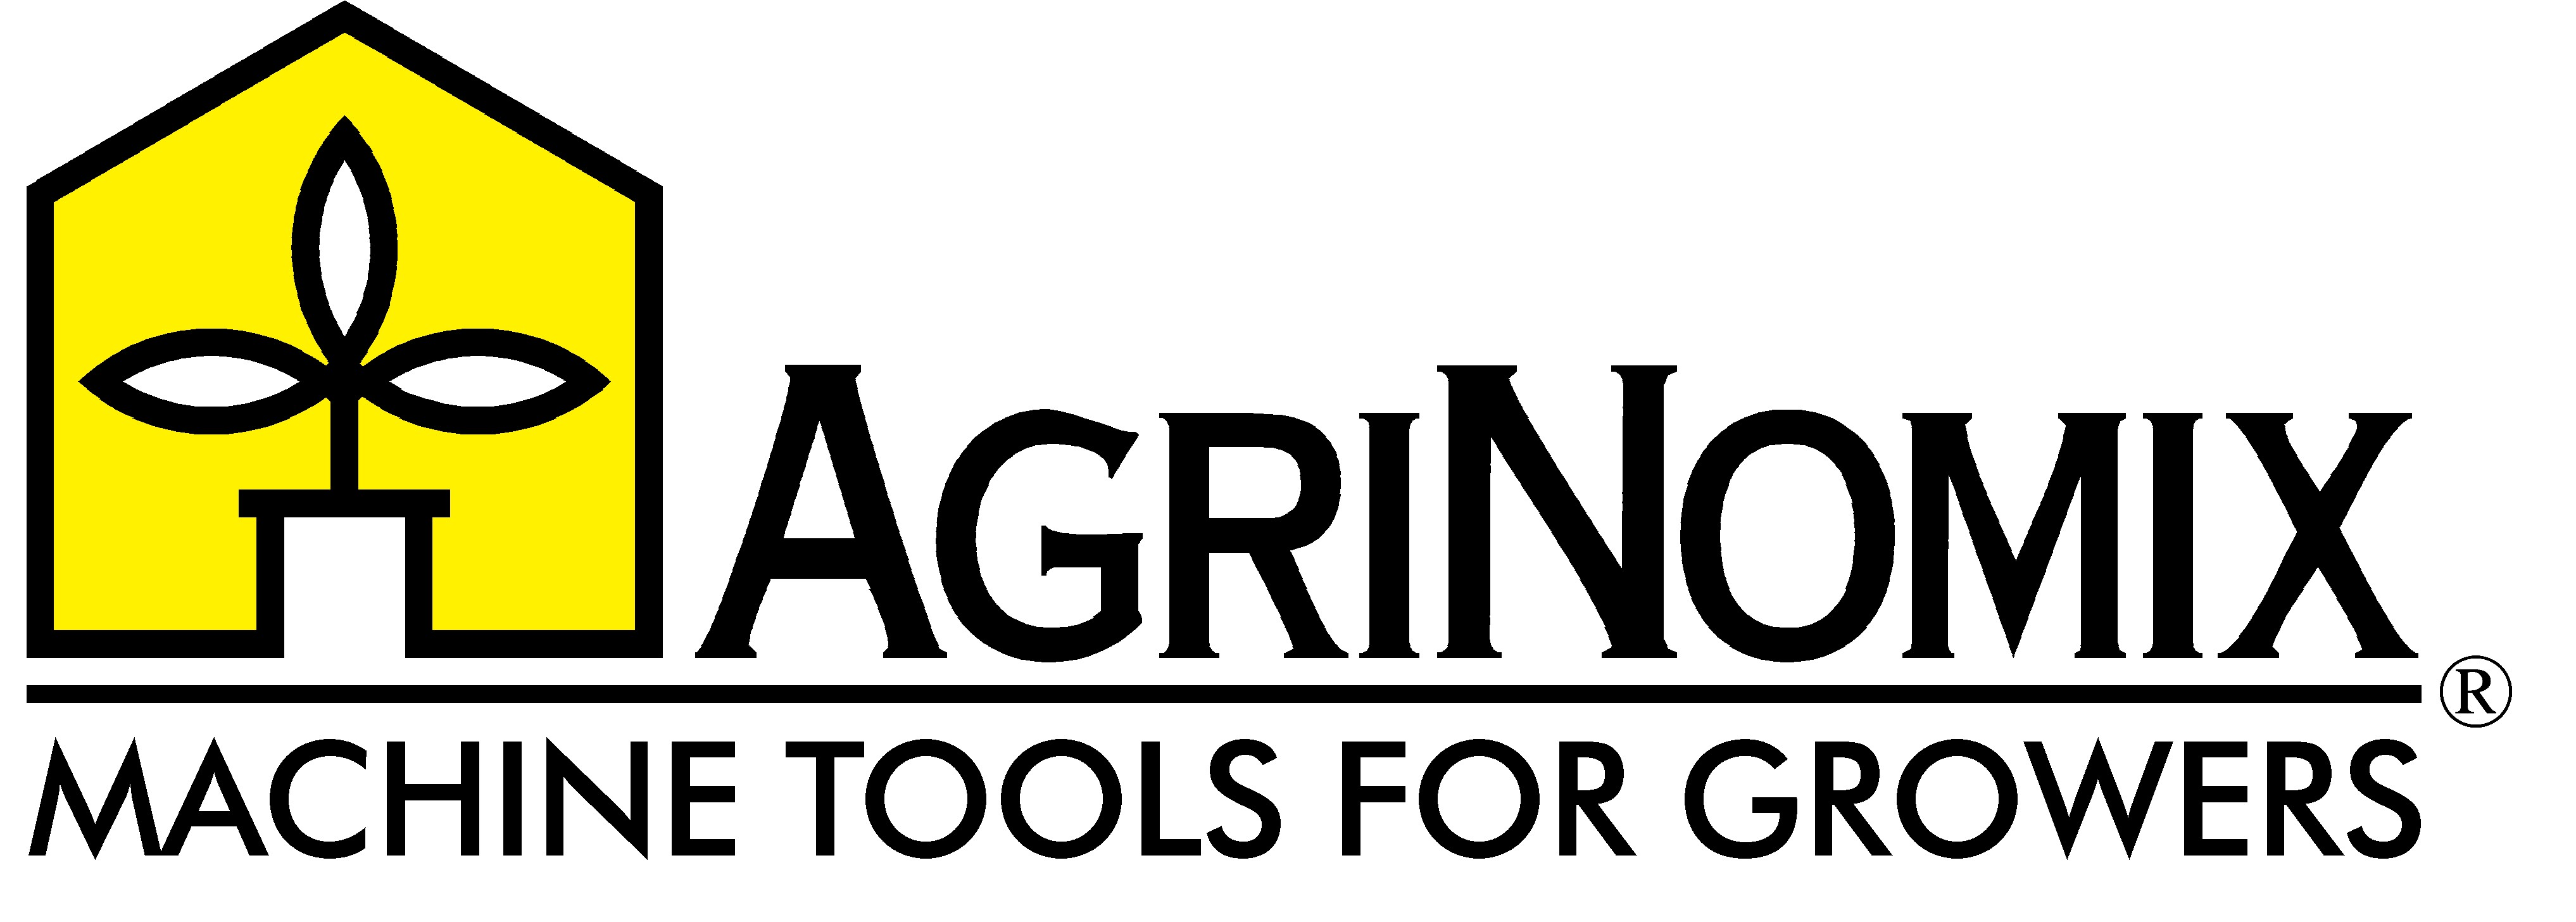 AGRILOGO-R.jpg